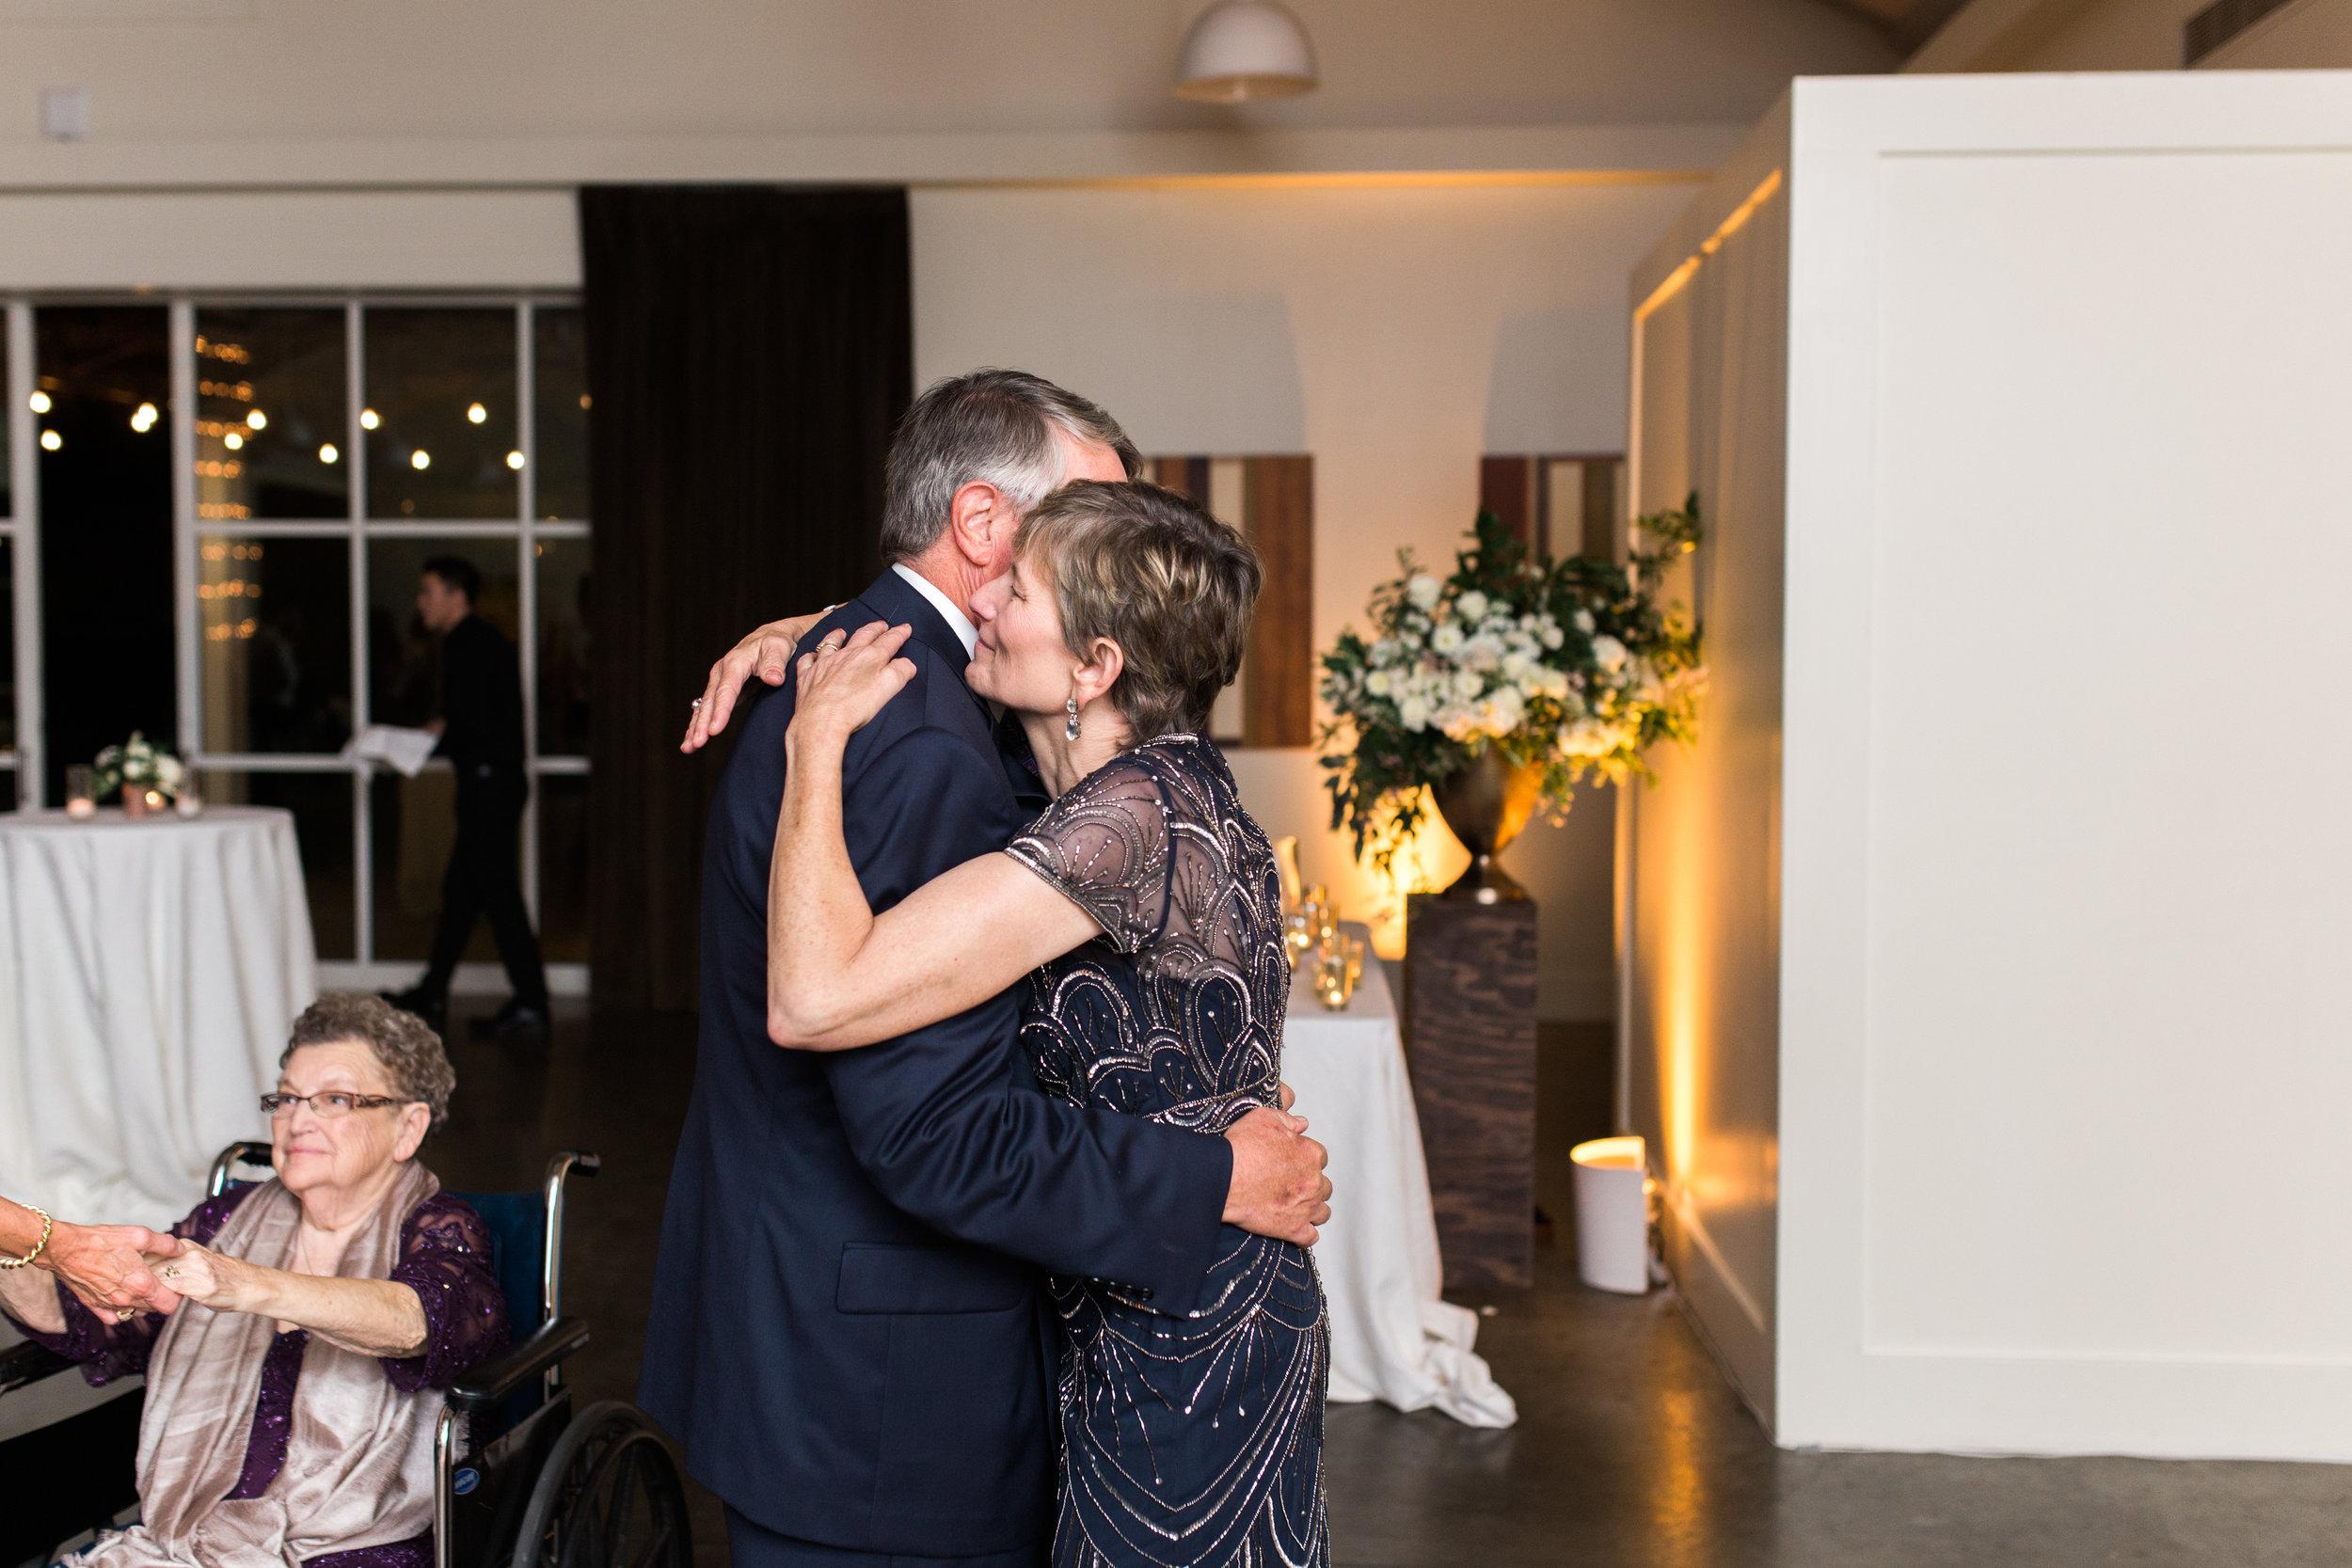 intimate-wedding-at-solage-calistoga-in-napa-121.jpg